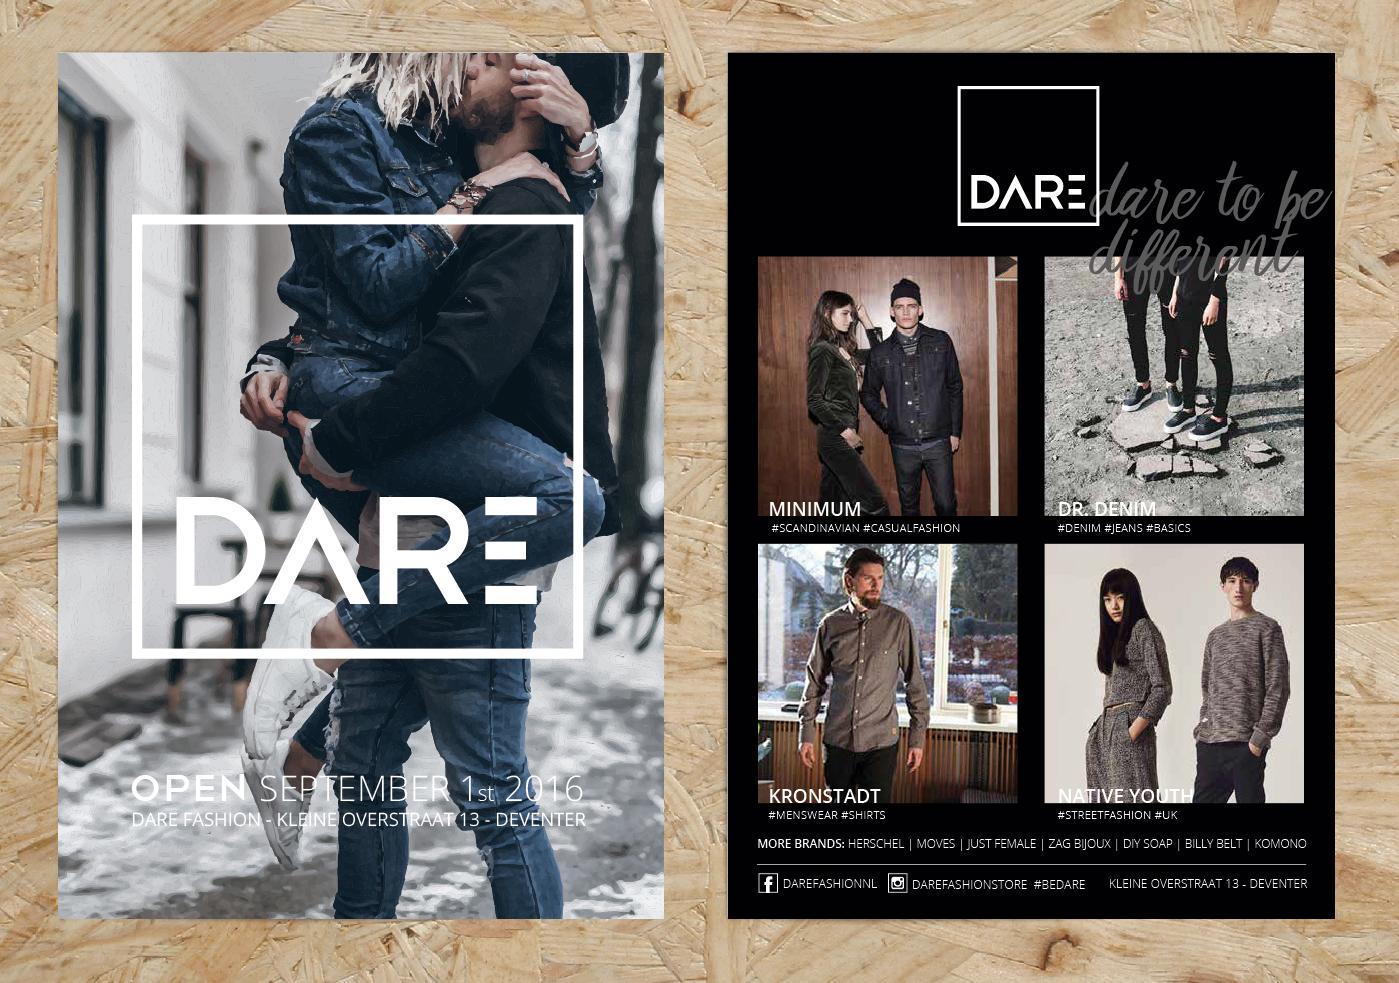 dare_flyer